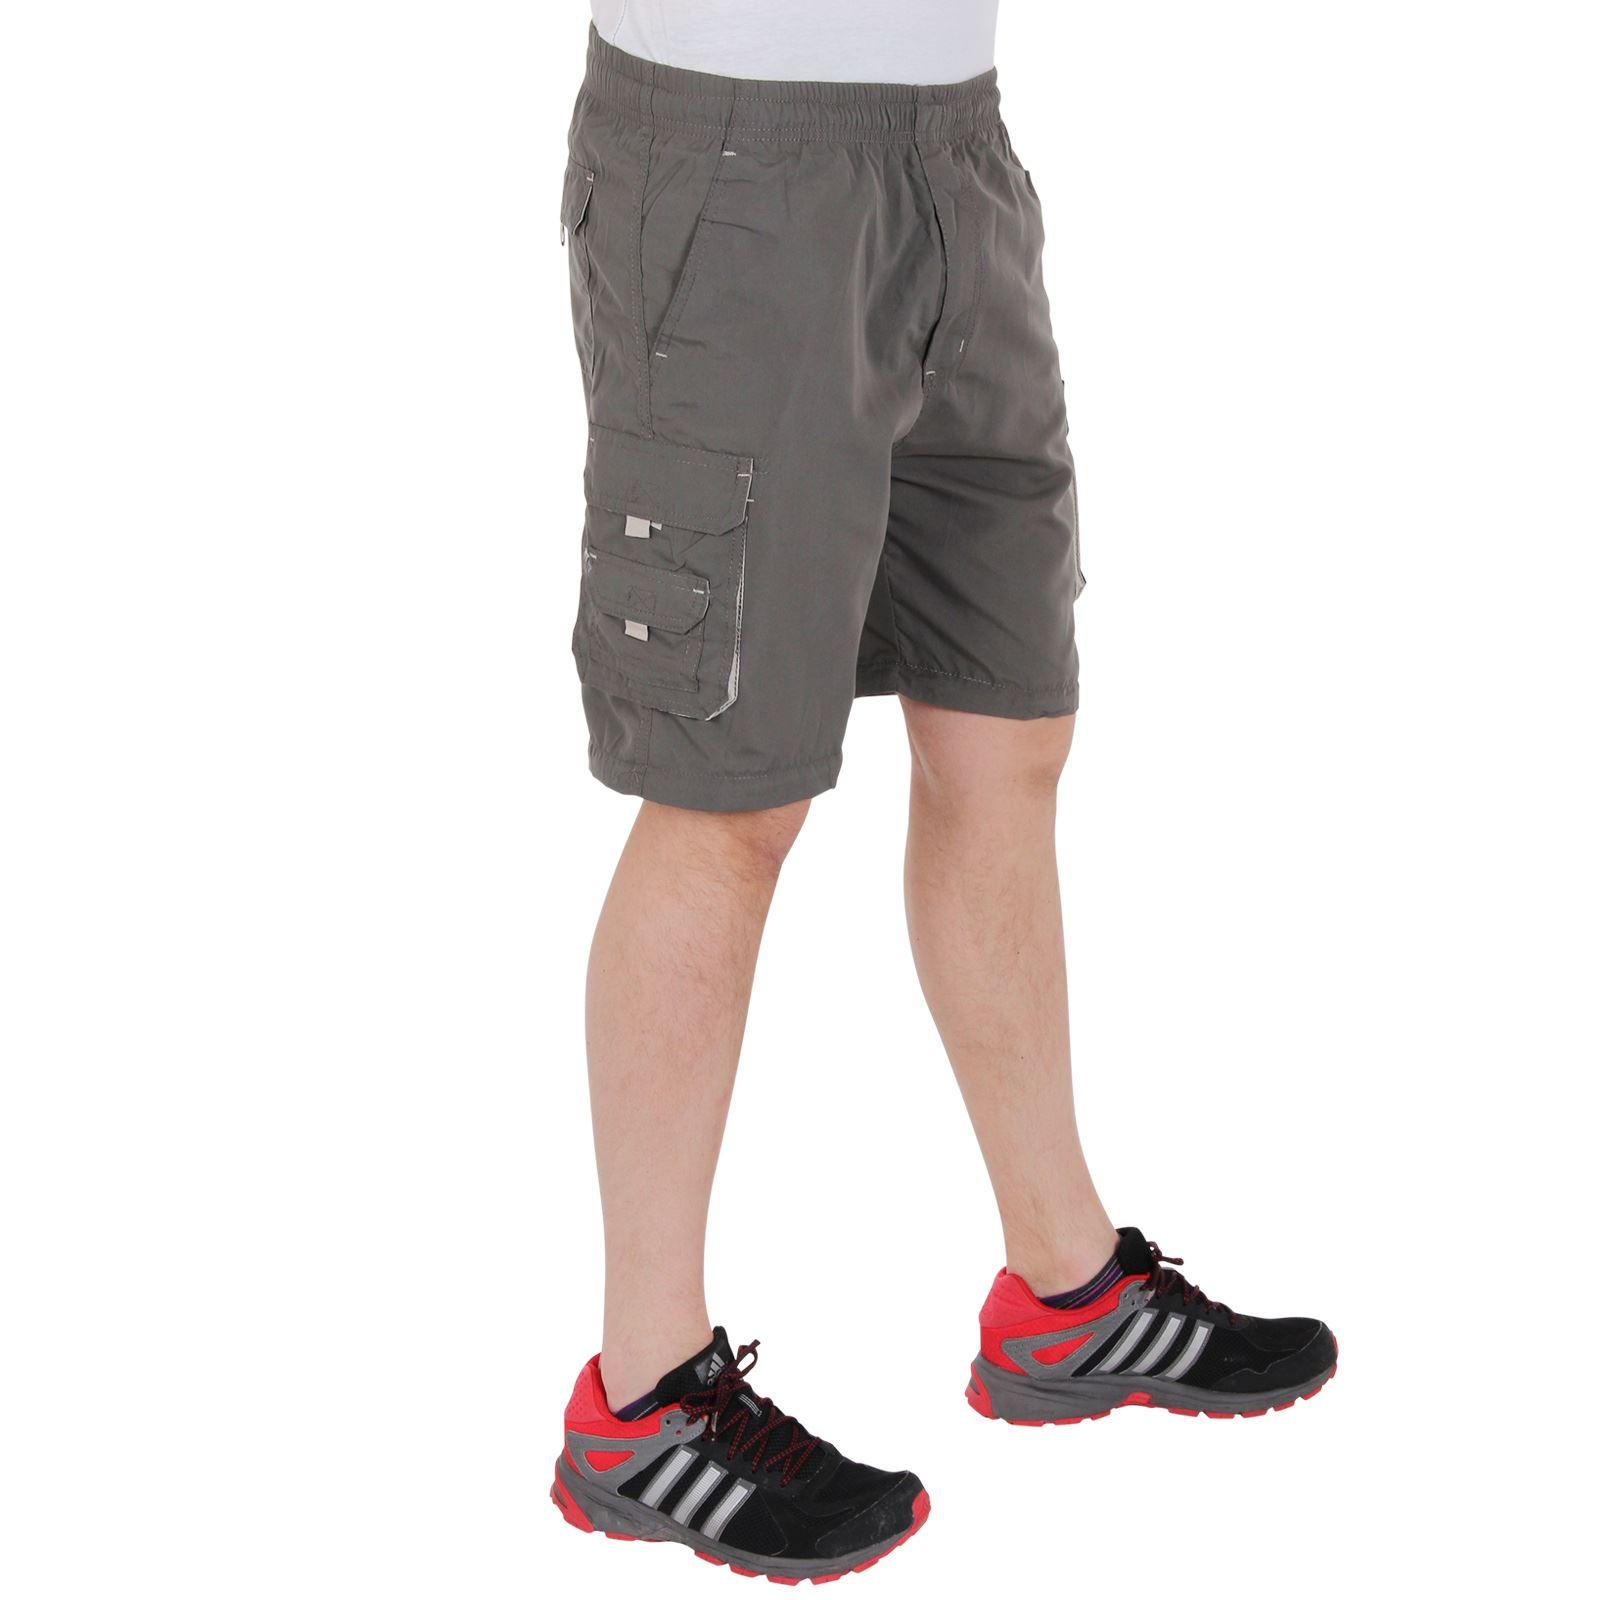 pantalon homme cargo militaire 3 en 1 zip transformable. Black Bedroom Furniture Sets. Home Design Ideas